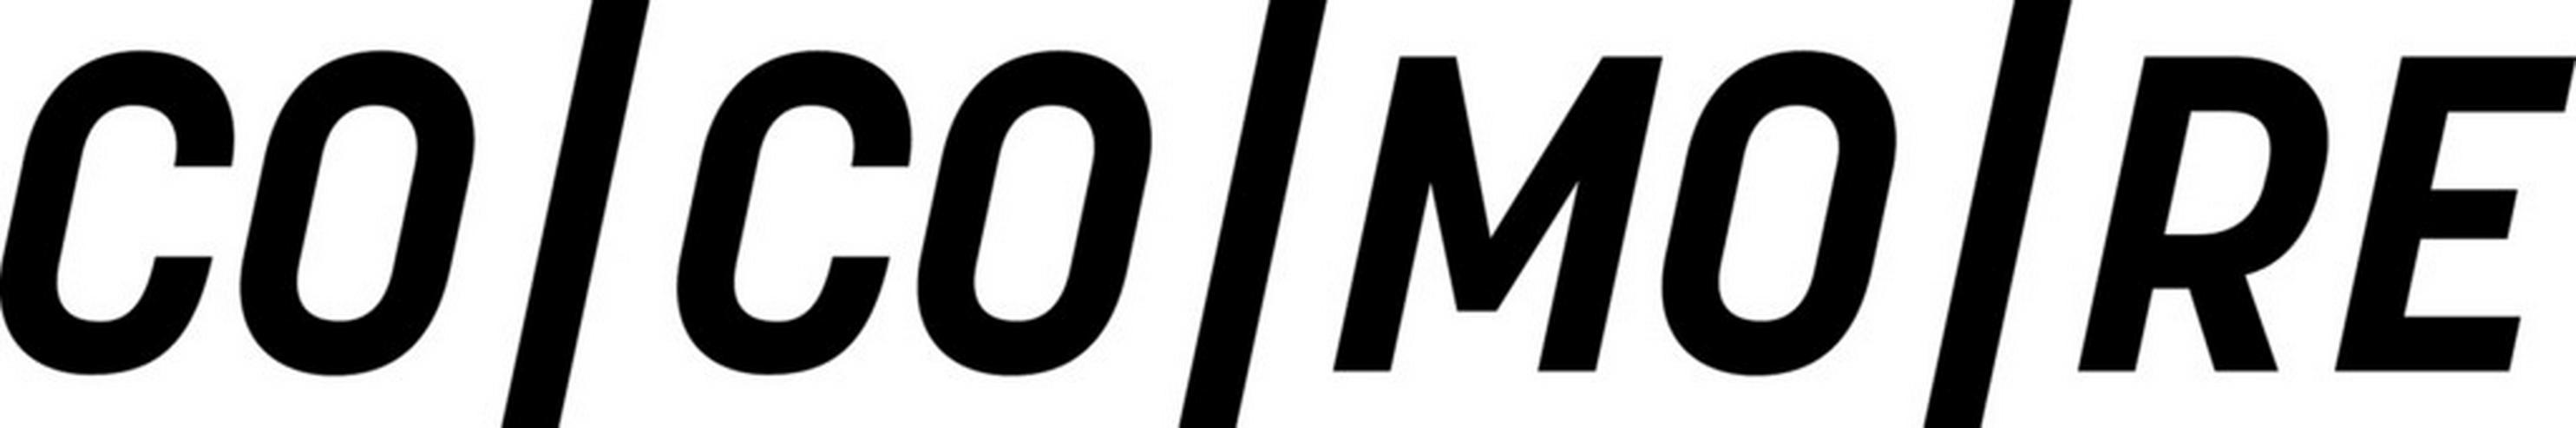 Senior Systemadministrator (m/w) - System- & Netzwerktechnik - Bild 1